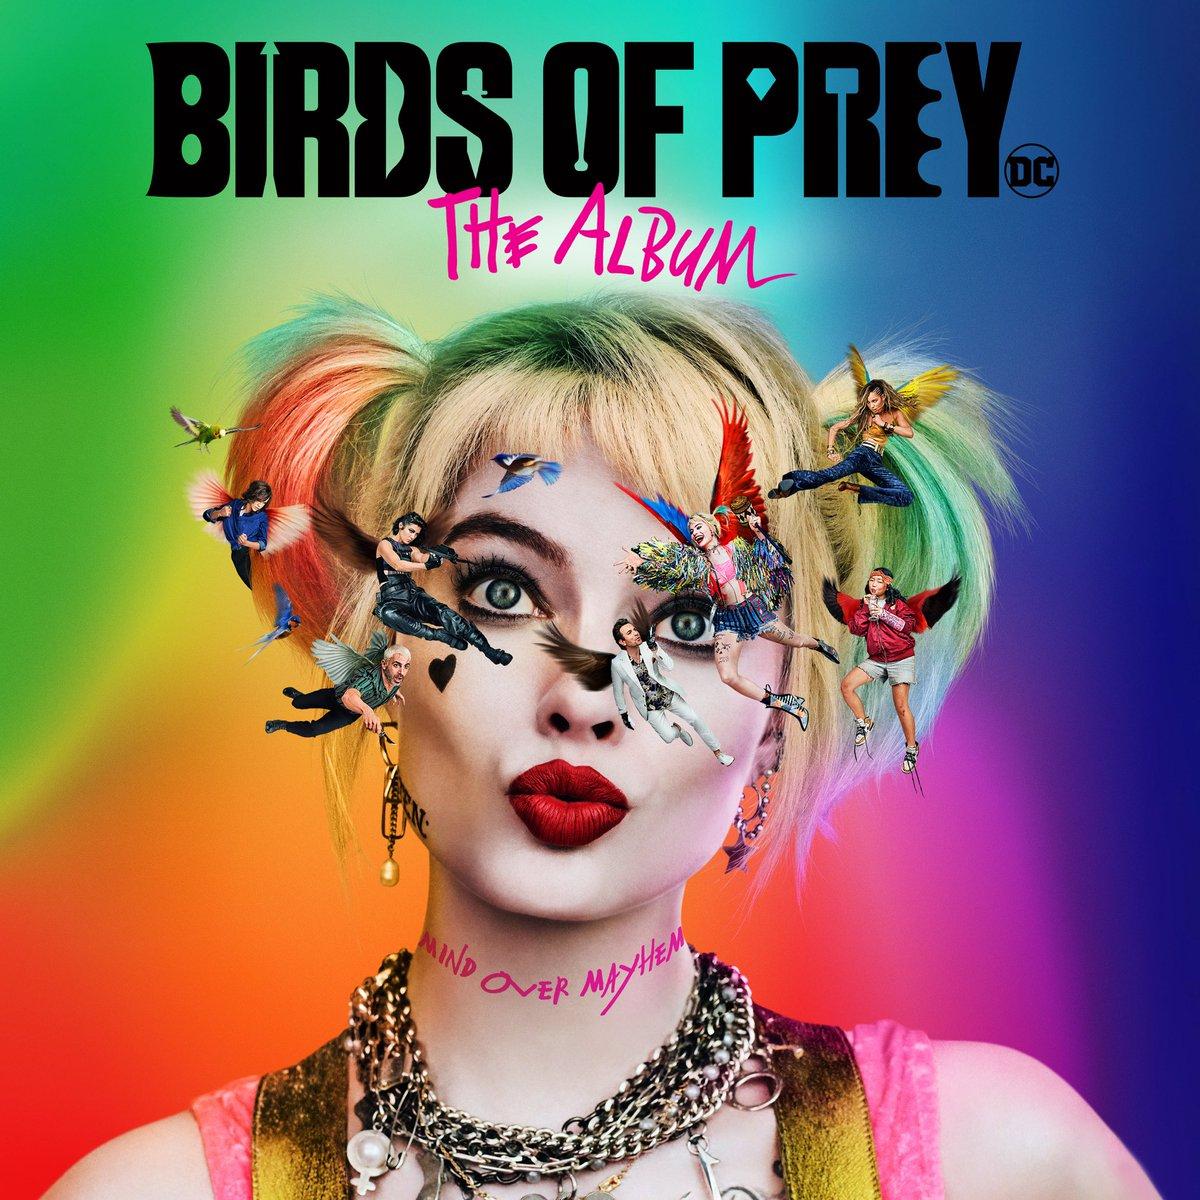 LET'S 👏 FREAKIN' 👏 DO 👏 THIS! 👏 #BirdsOfPrey @DojaCat @Normani @theestallion @halsey @IAMSUMMERWALKER @Saweetie @LaurenJauregui @kflay @charlottelawr @maisiehpeters @WHIPPEDCREAM @babygothxx @GALXARA @cynthialovely @iamjuceefroot @sofitukker @ADONA_music @jurneesmollett https://t.co/449ORKq1Dr